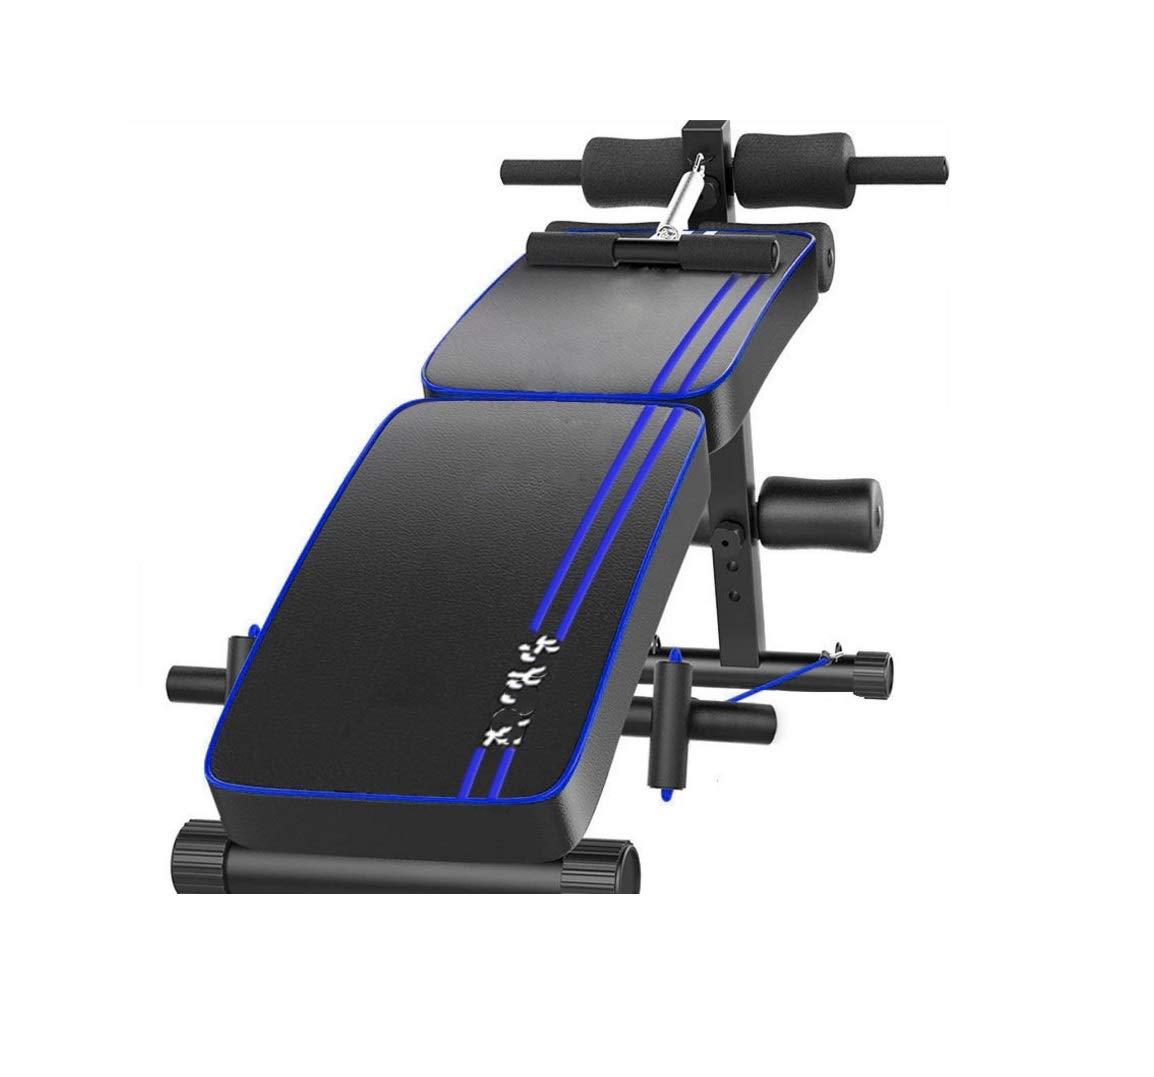 Chaopeng 仰臥ボード二重折り安全と快適な家庭用多機能ボード男性と女性は腹部の腹部フィットネス機器を減らす   B07QR5MKD1